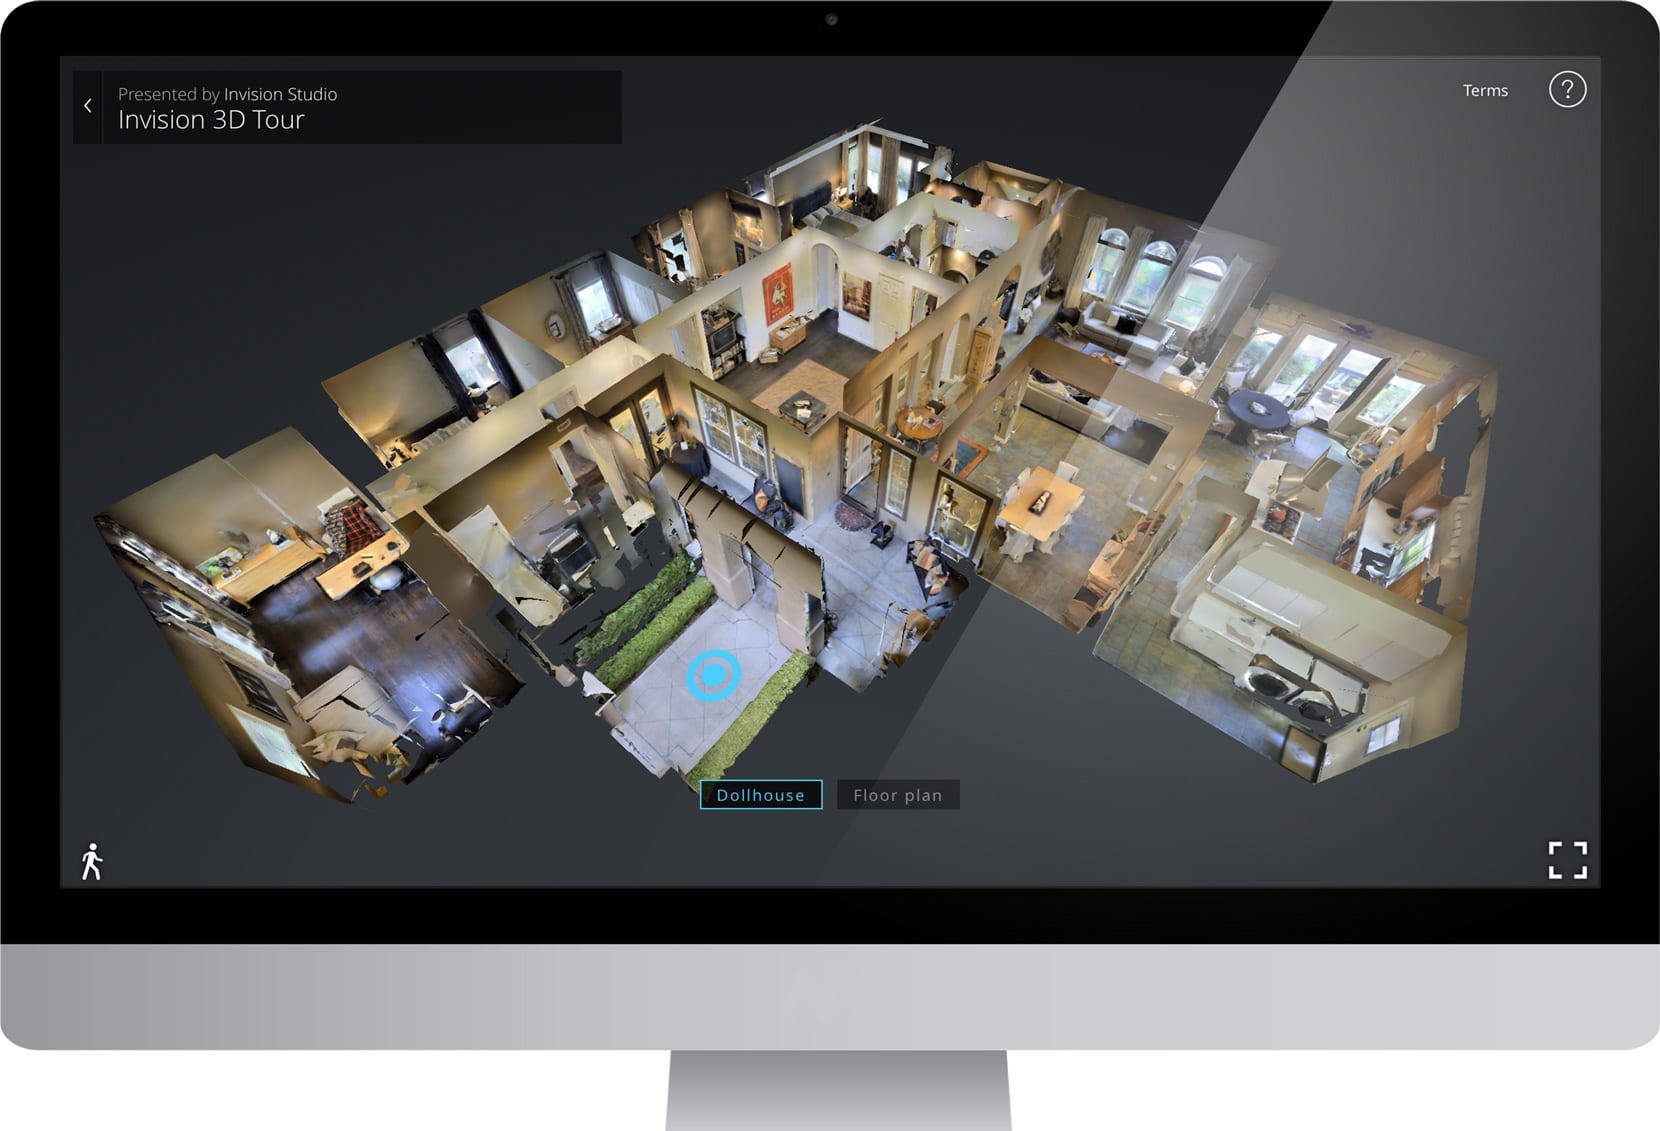 Invision Studio Matterport Tours